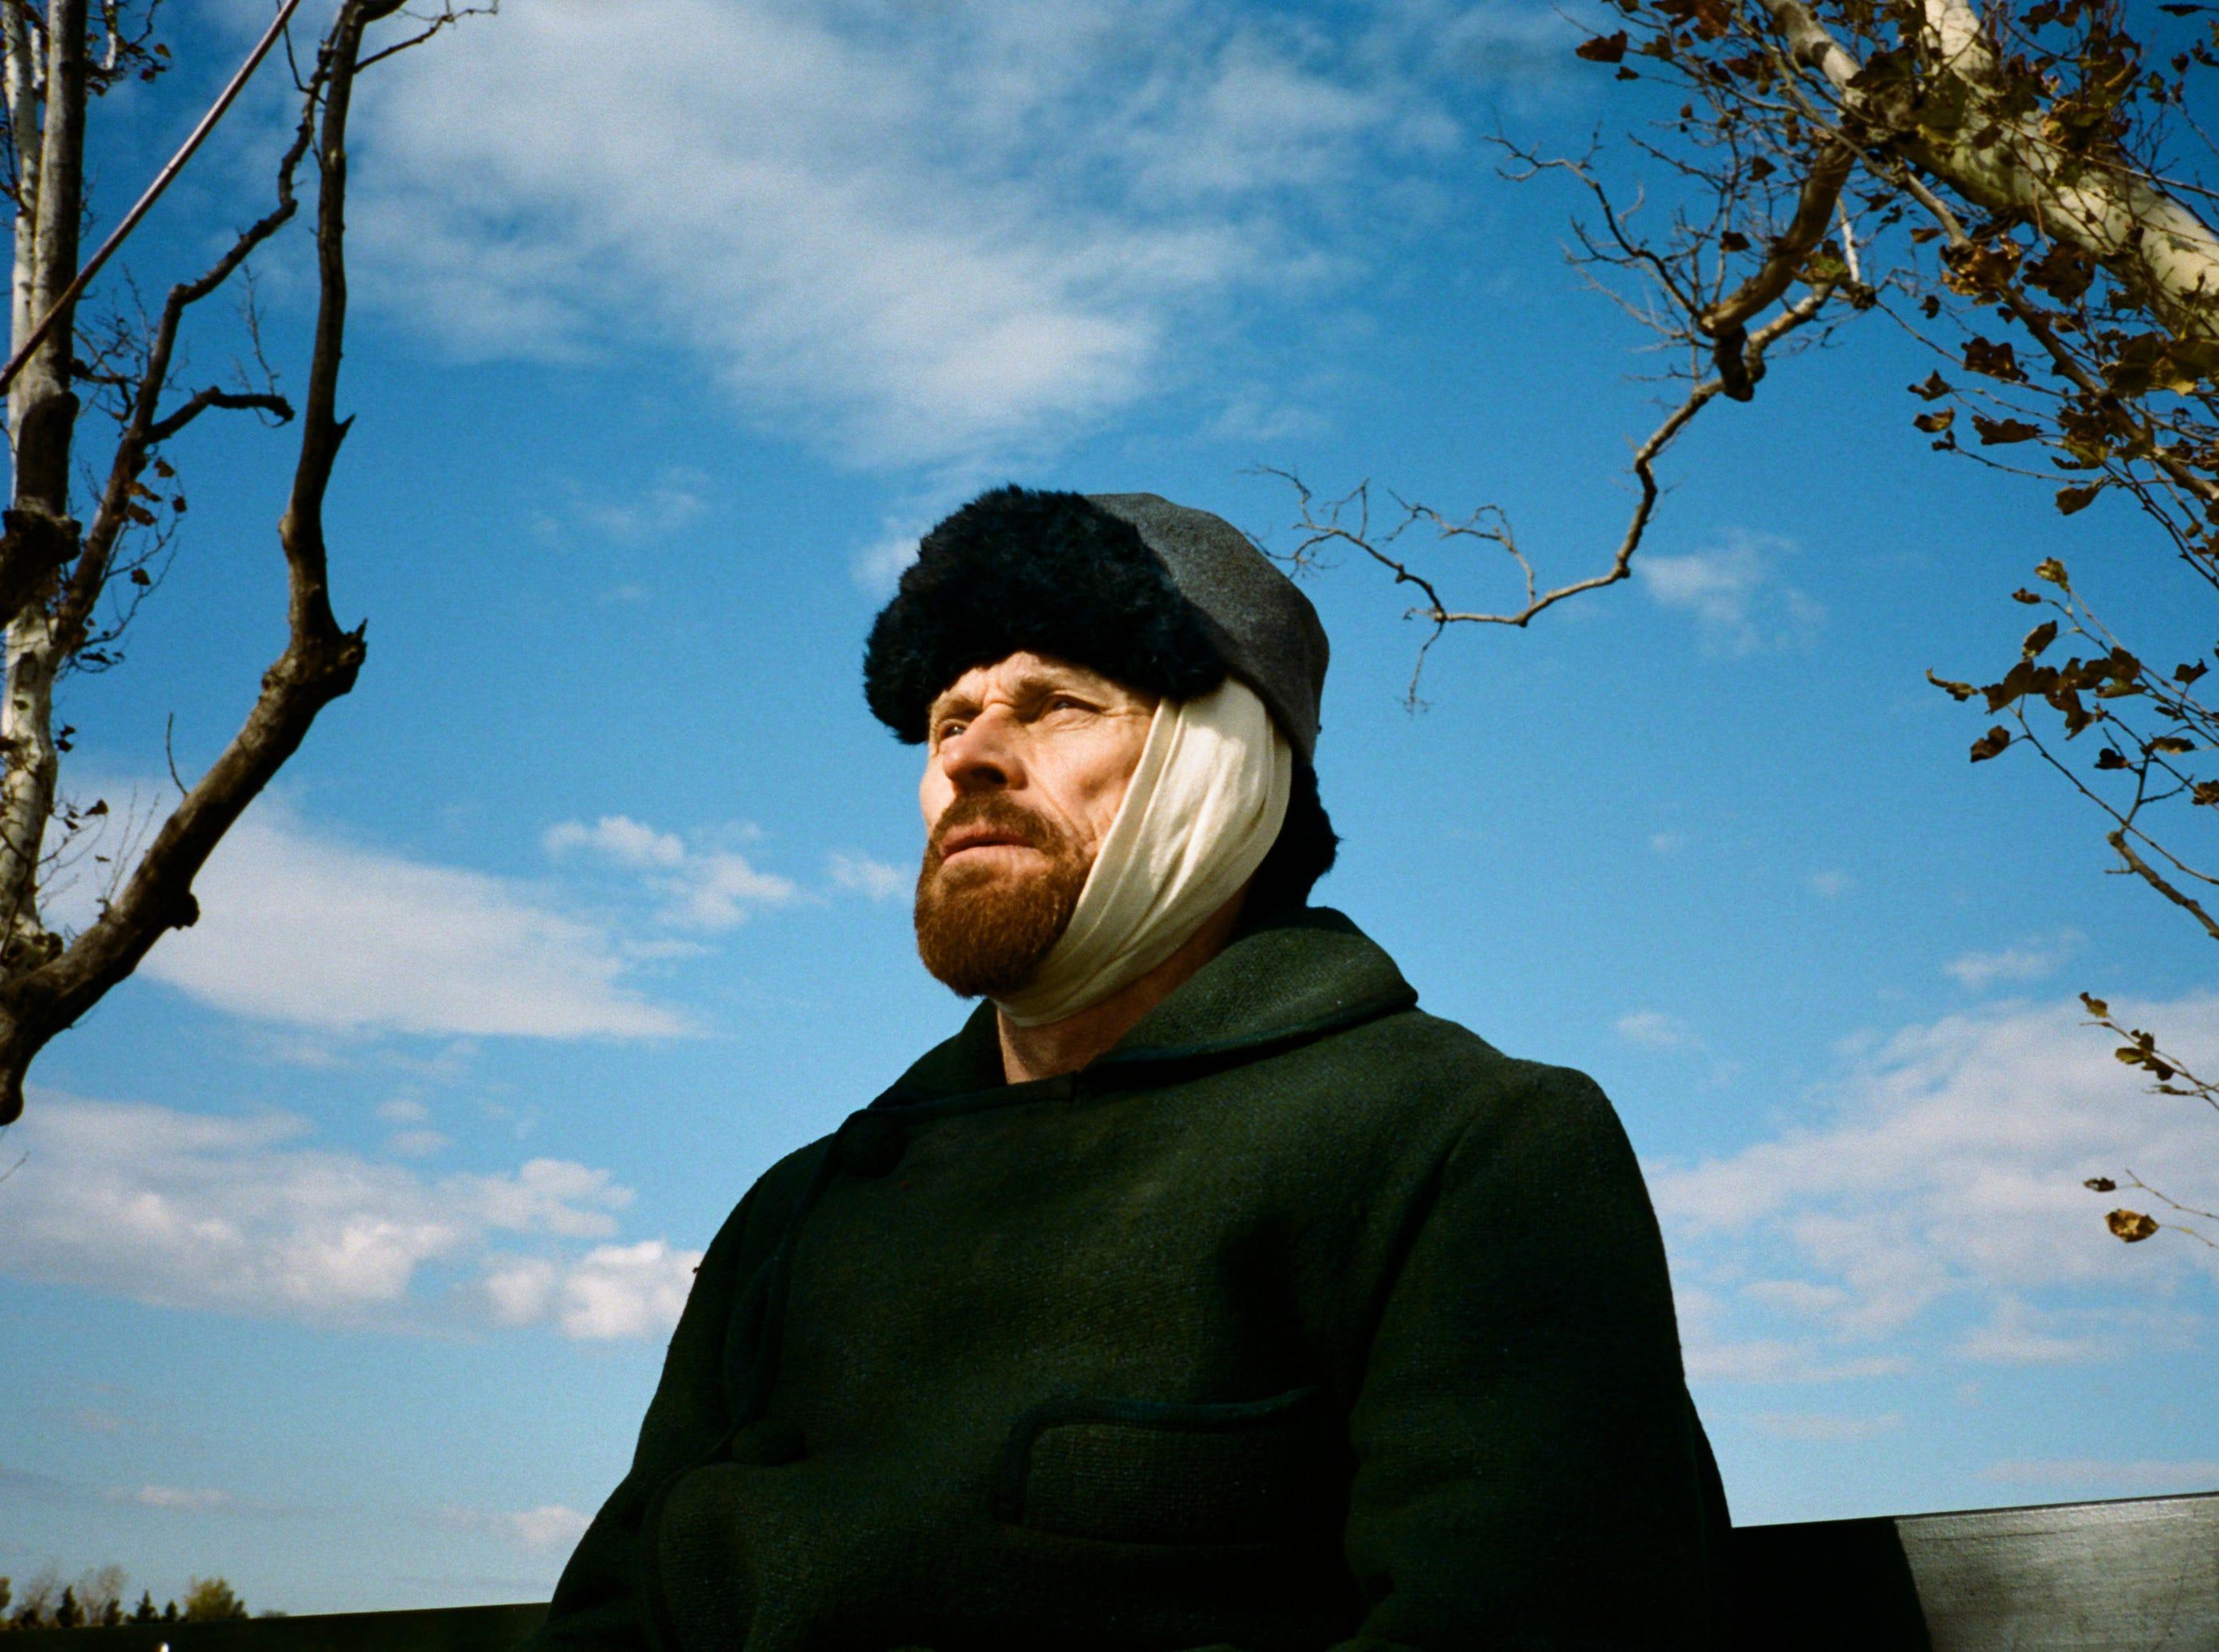 'At Eternity's Gate' review: Singular and strange portrait of Vincent van Gogh